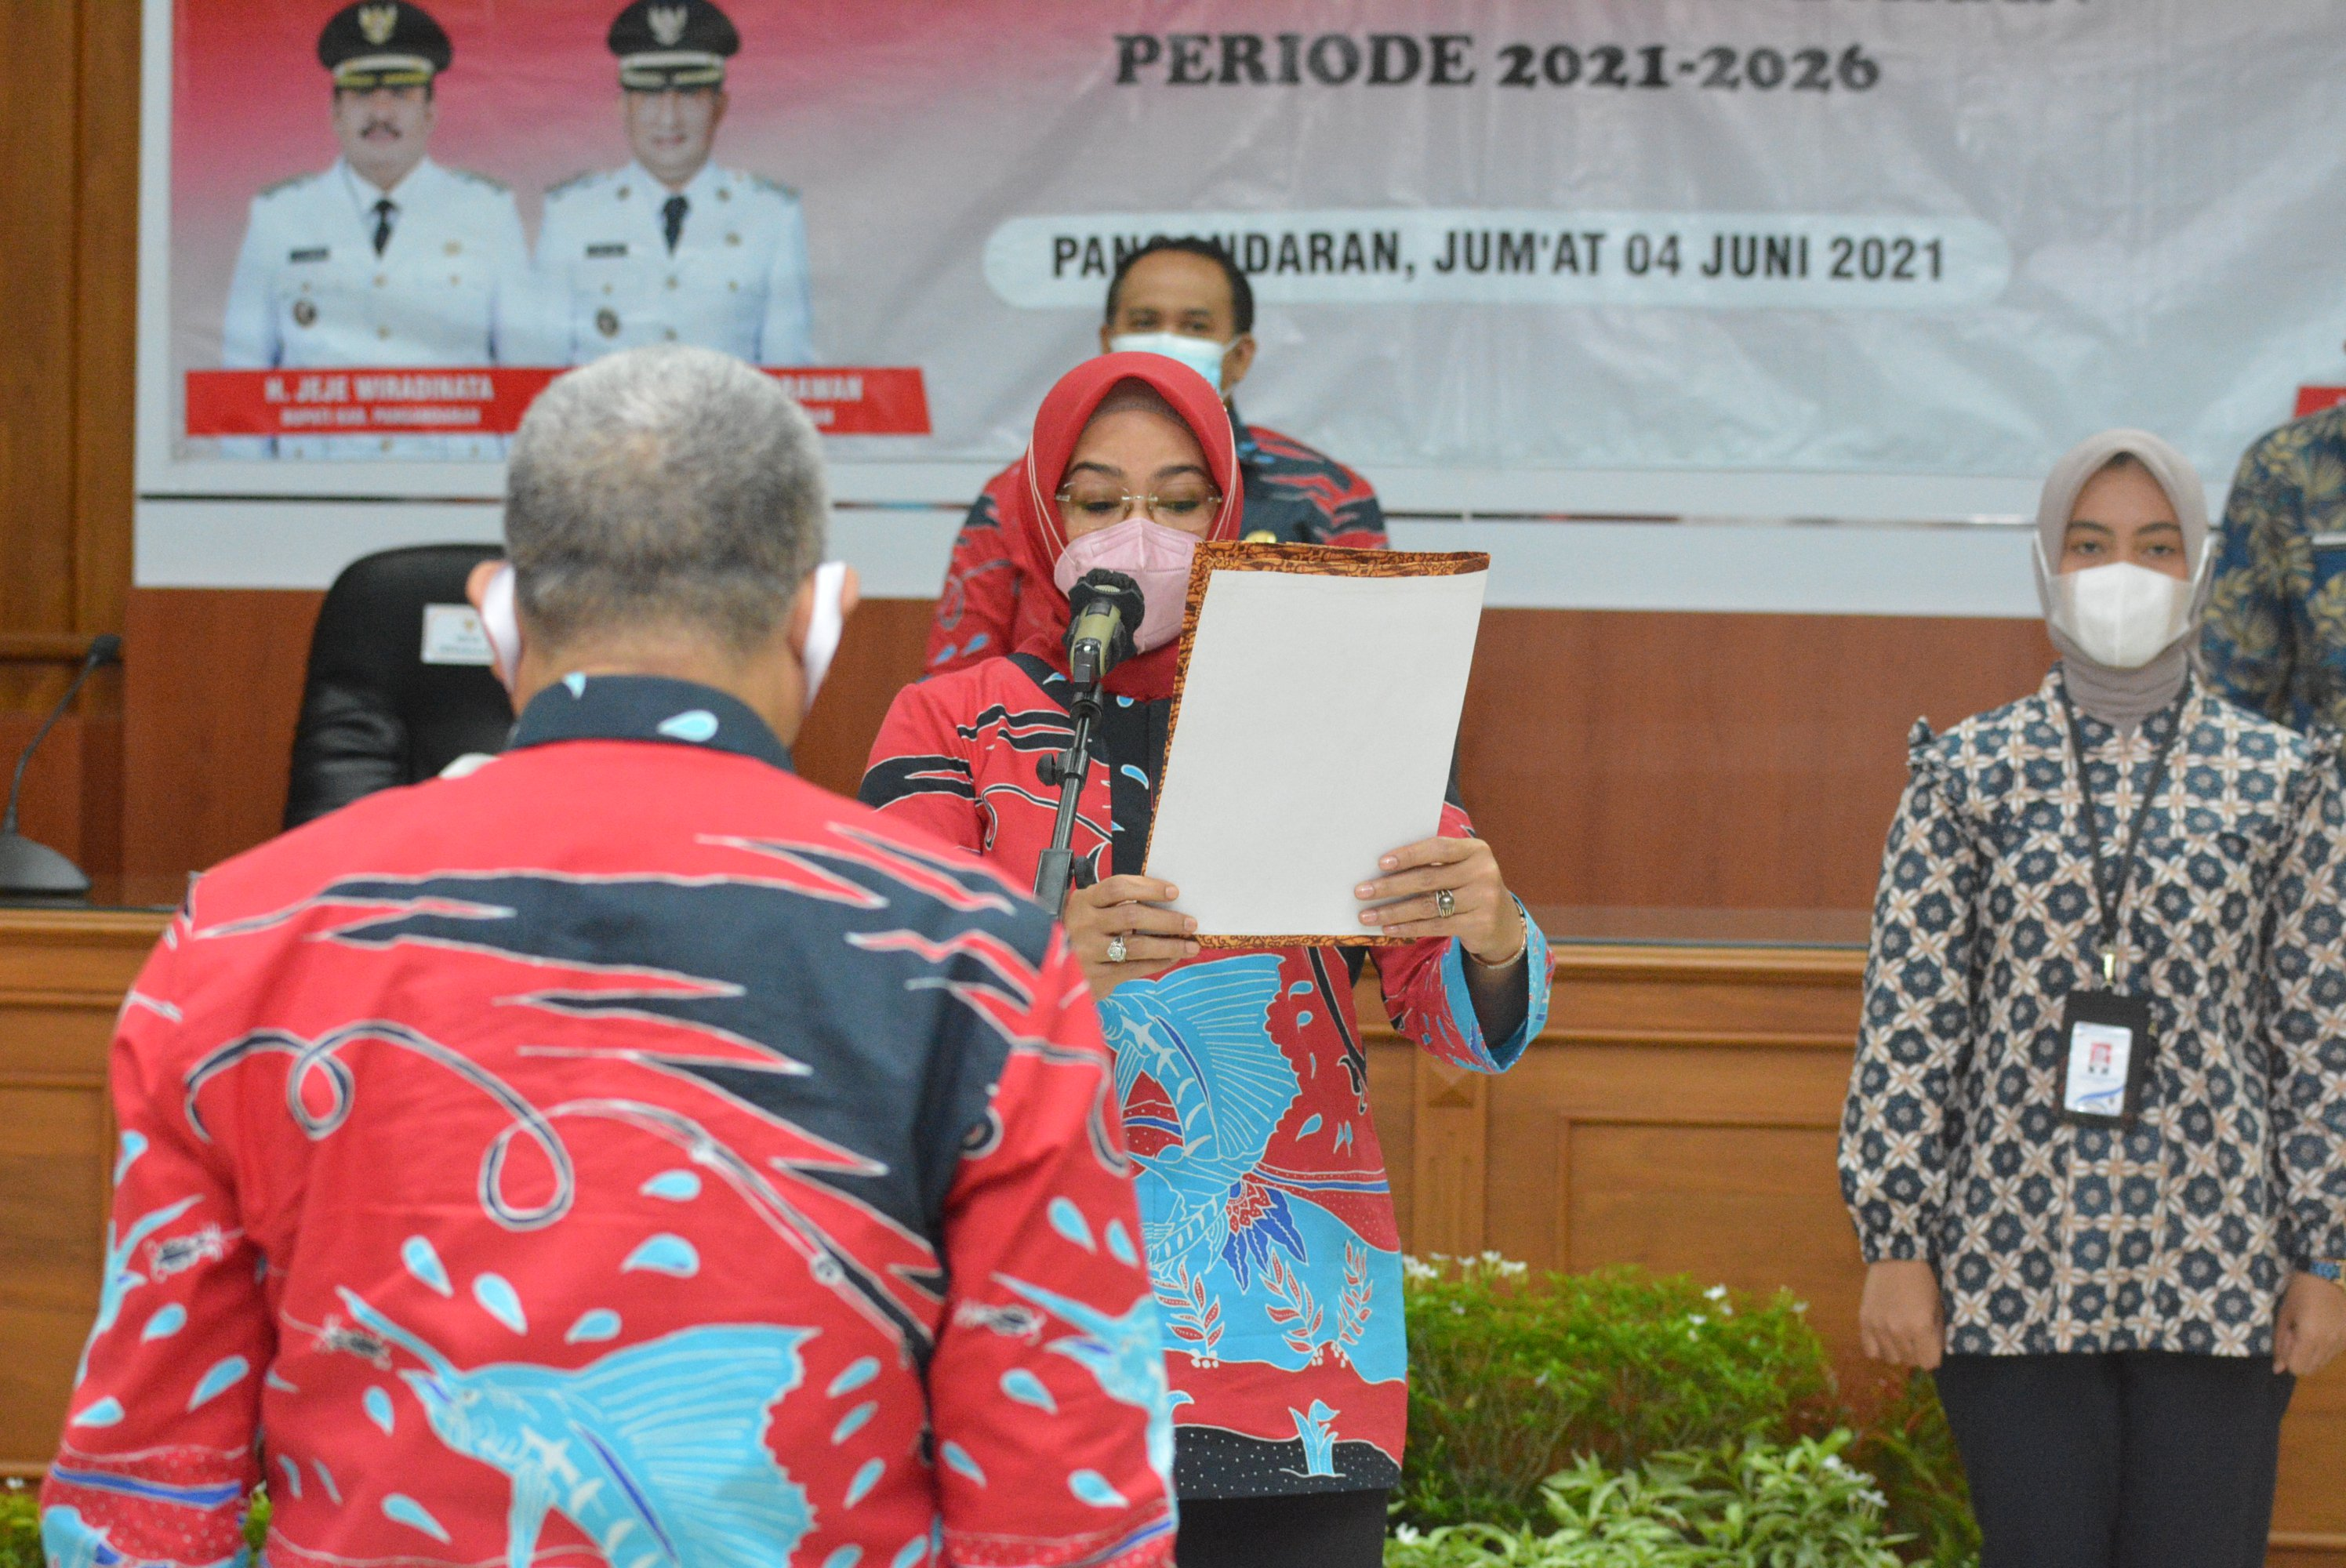 Pengurus Dekranasda Kabupaten Pangandaran Periode 2021-2026 Dilantik